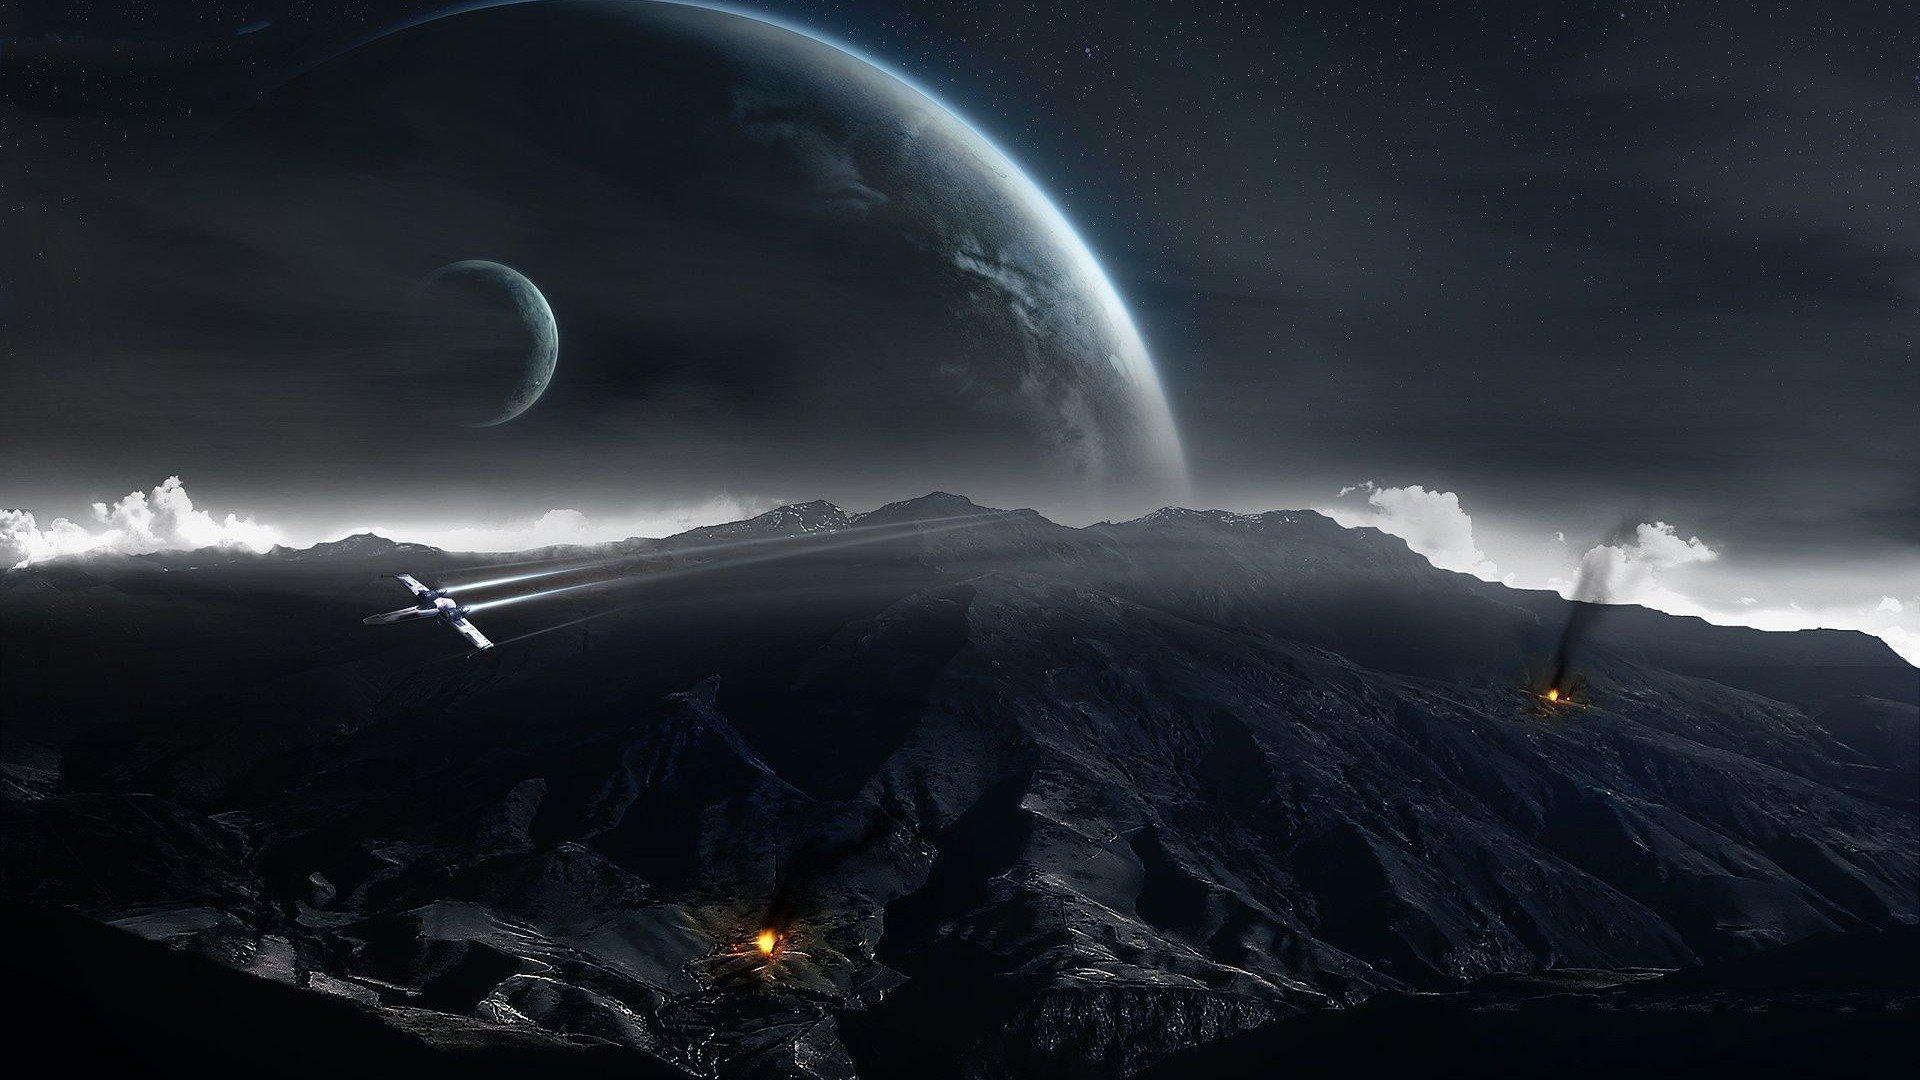 mystery sci fi futuristic film spaceship space wallpaper background 1920x1080